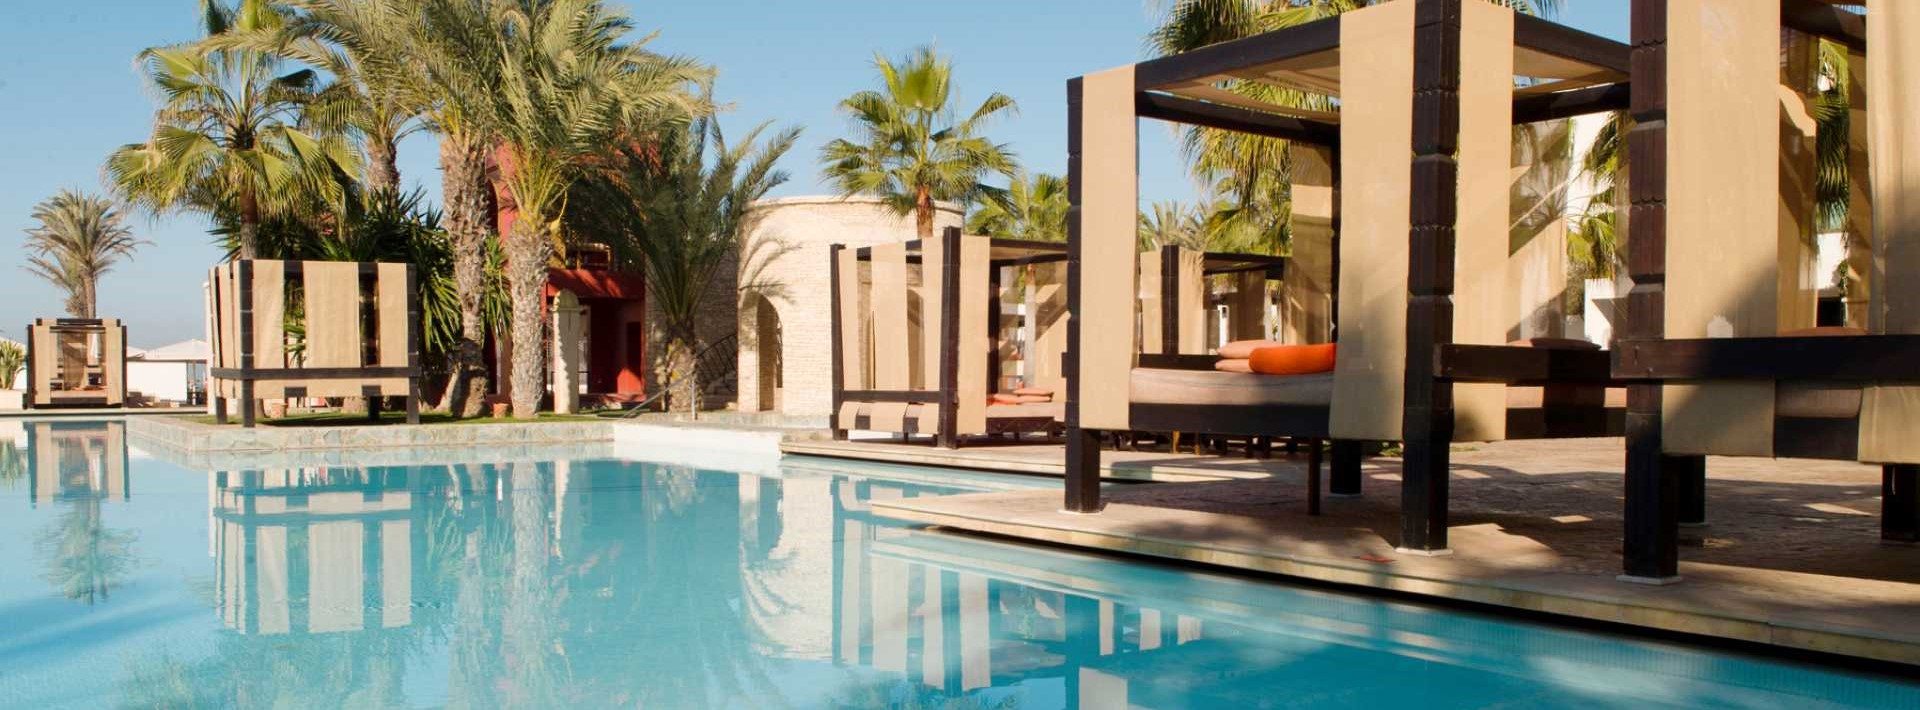 sofitel-agadir-royal-bay-resort-pool